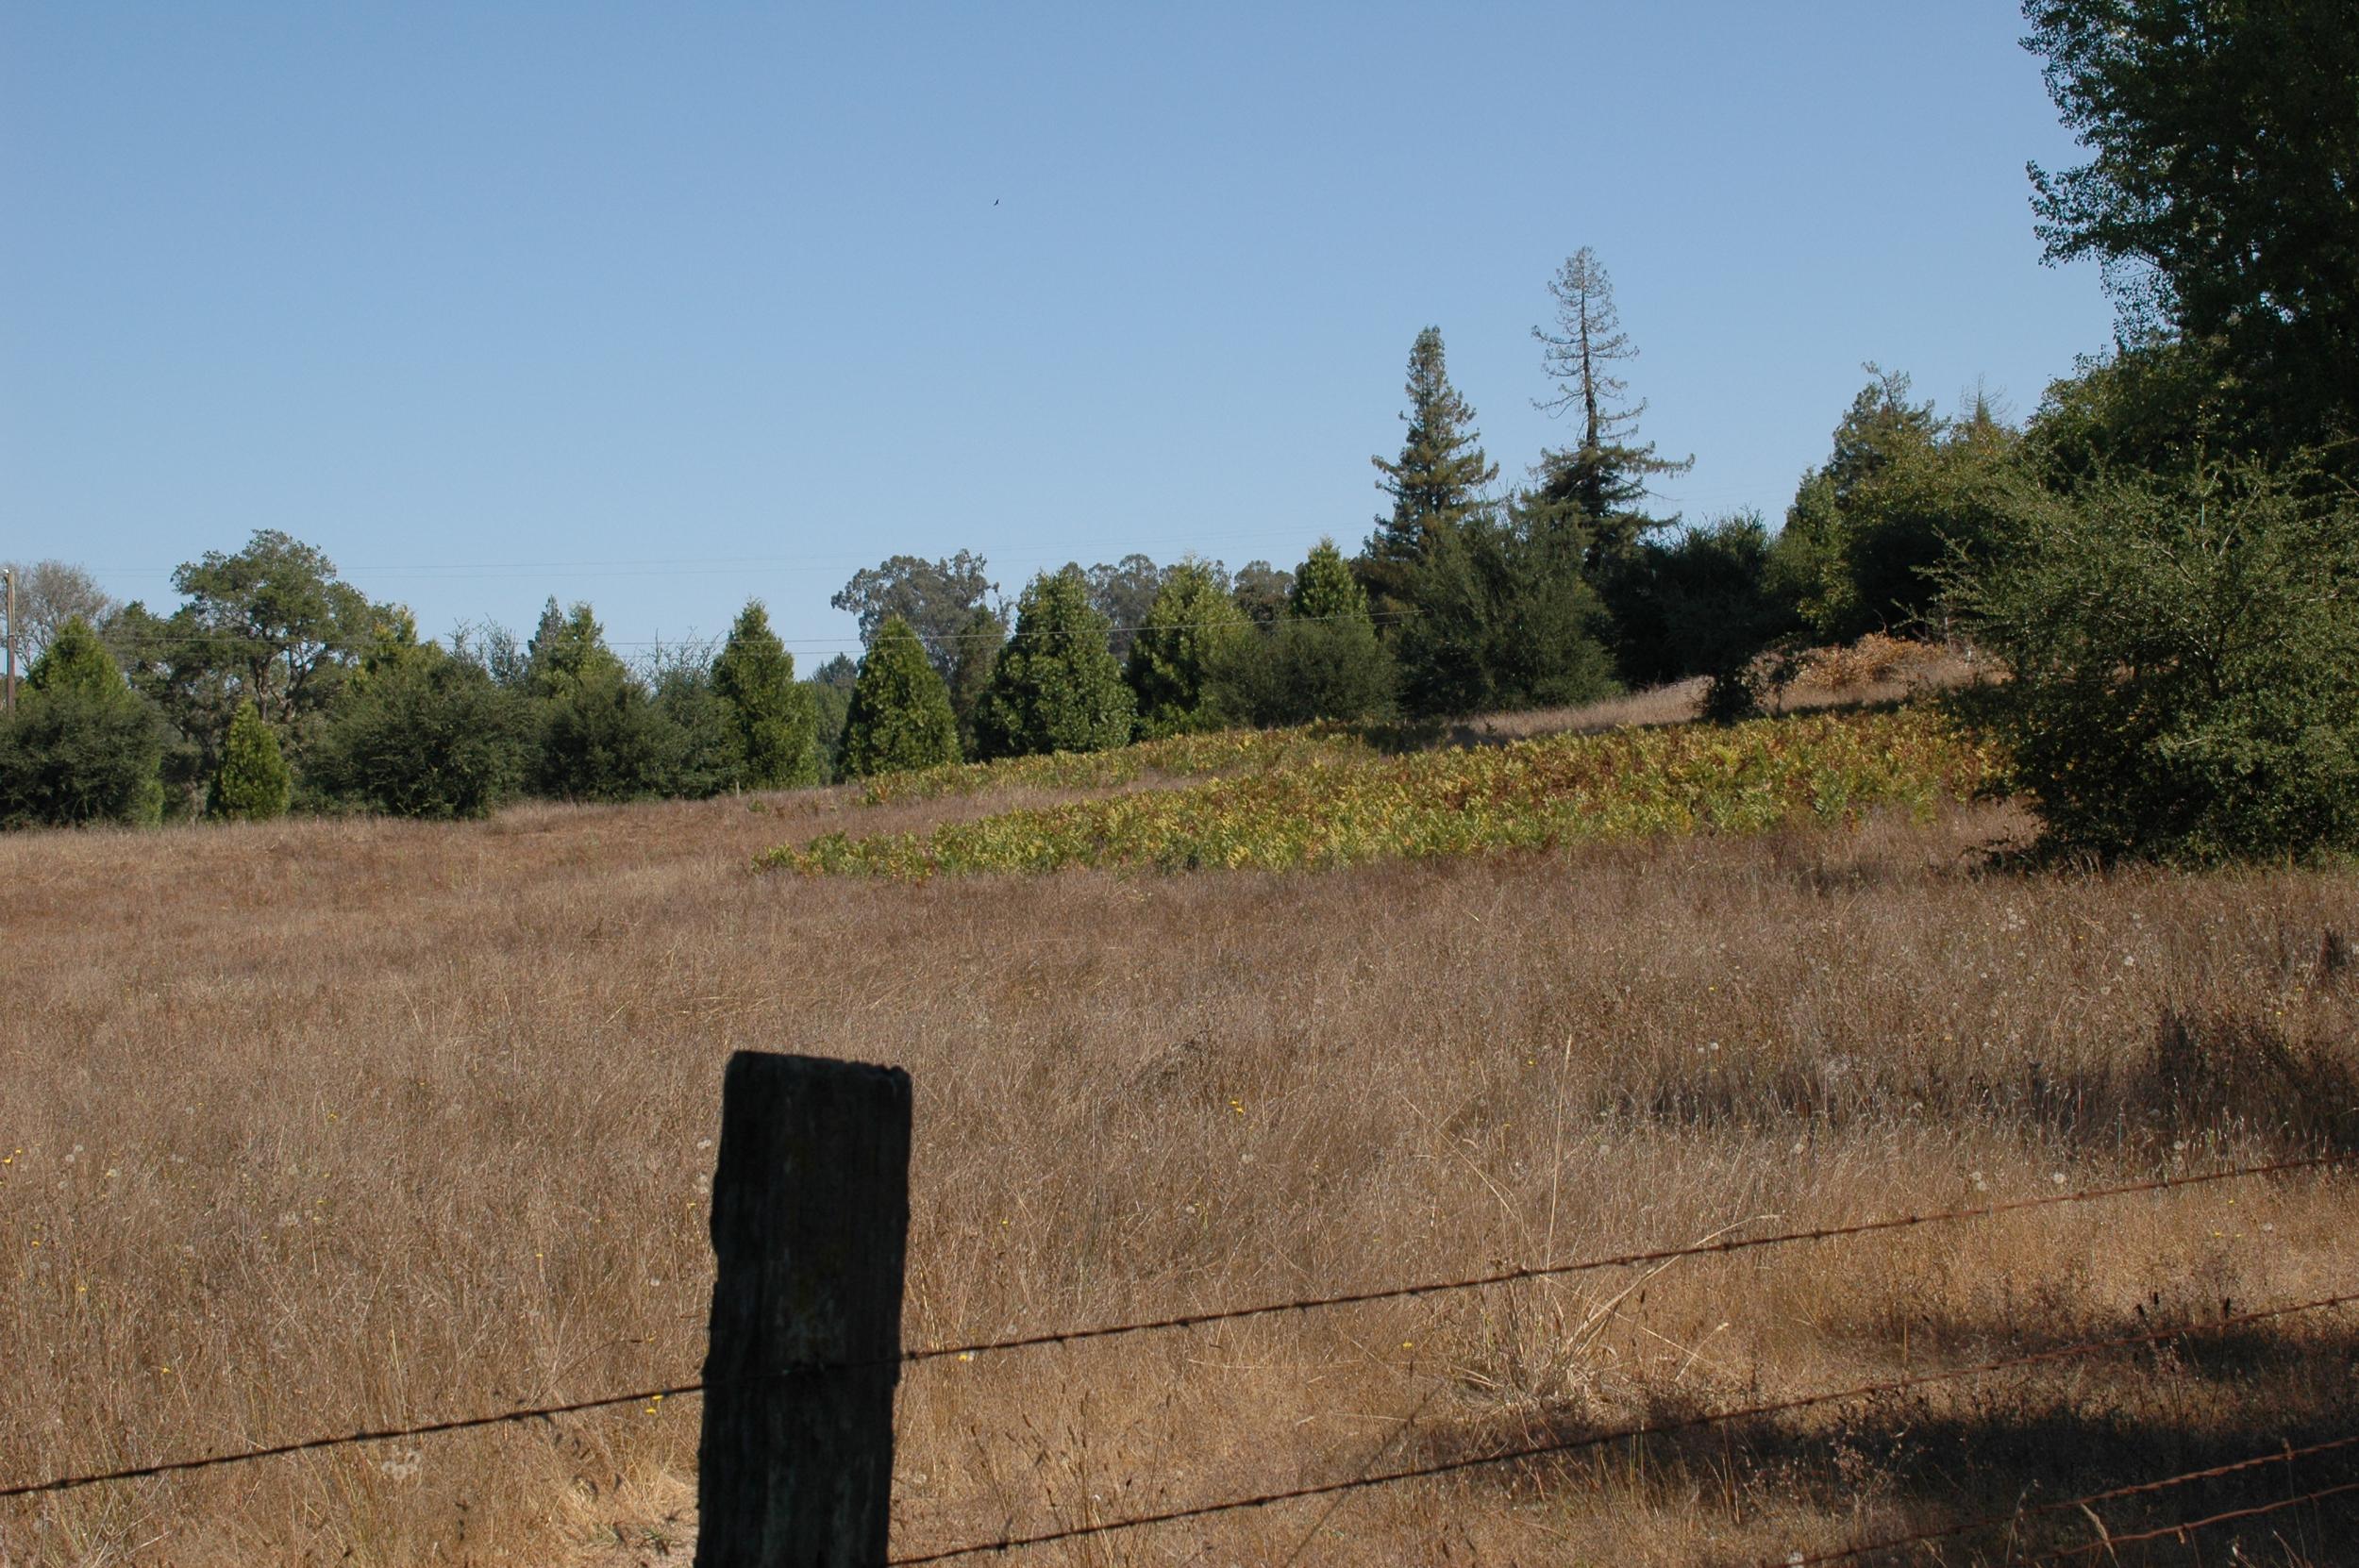 The future vineyard